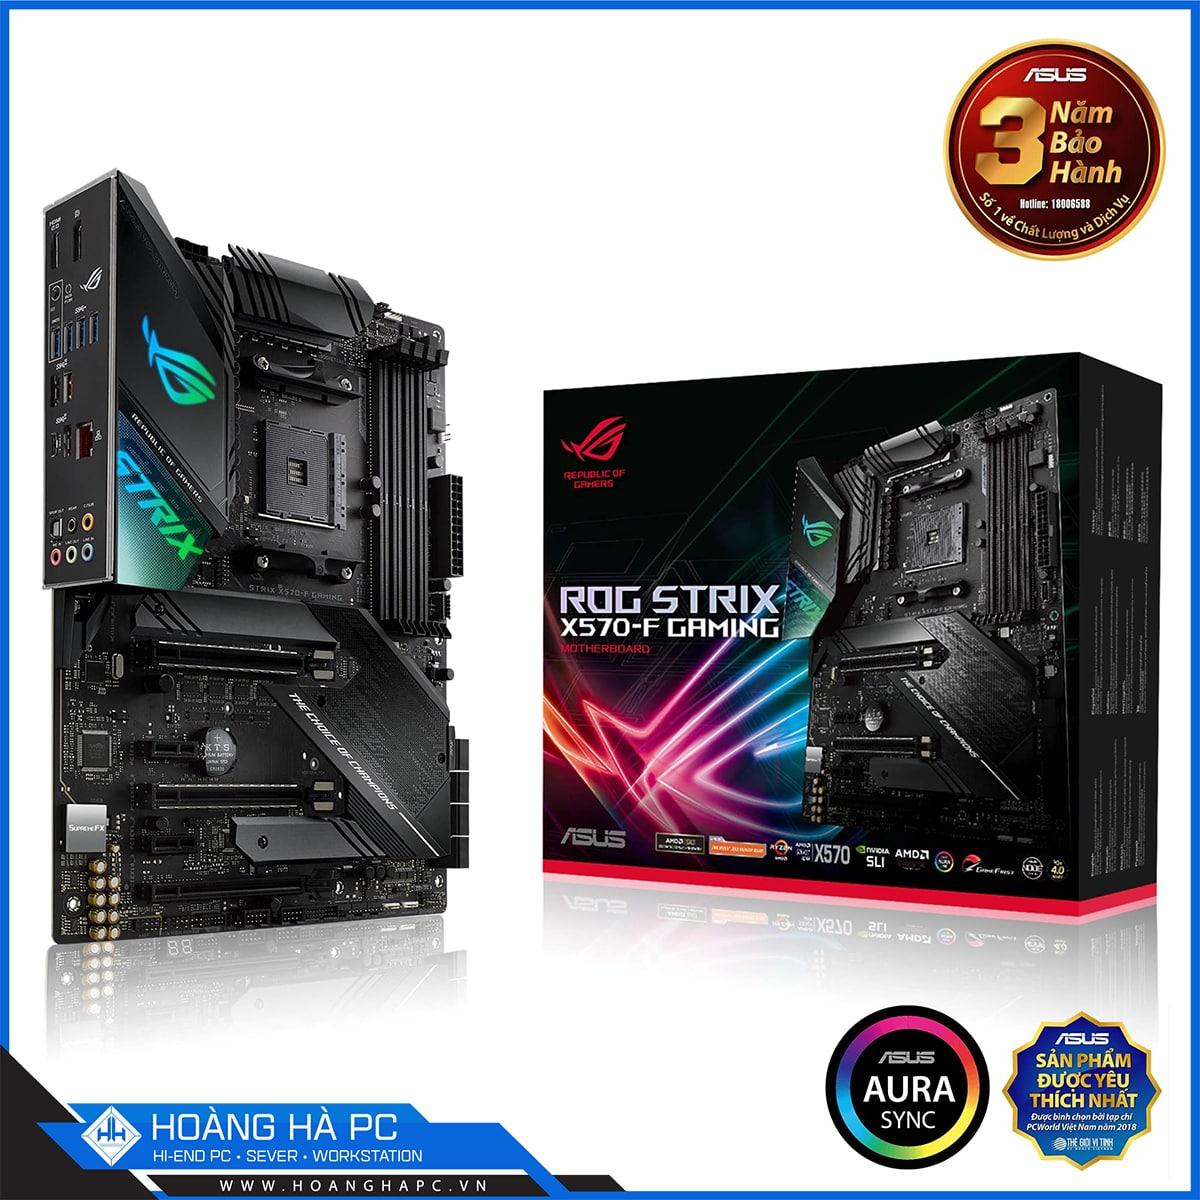 Mainboard Asus ROG STRIX X570-F Gaming